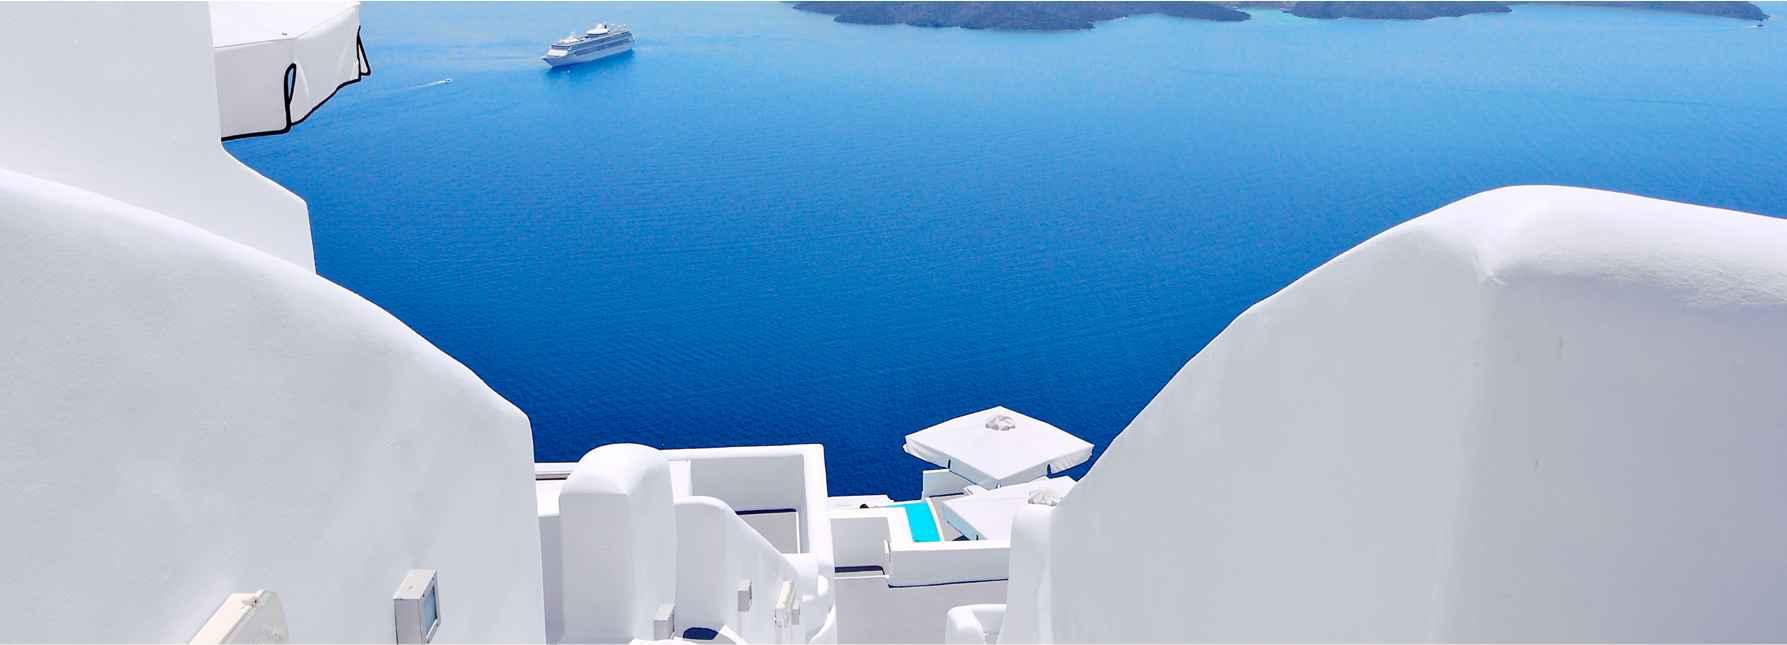 Greek Hotel_11zon.png